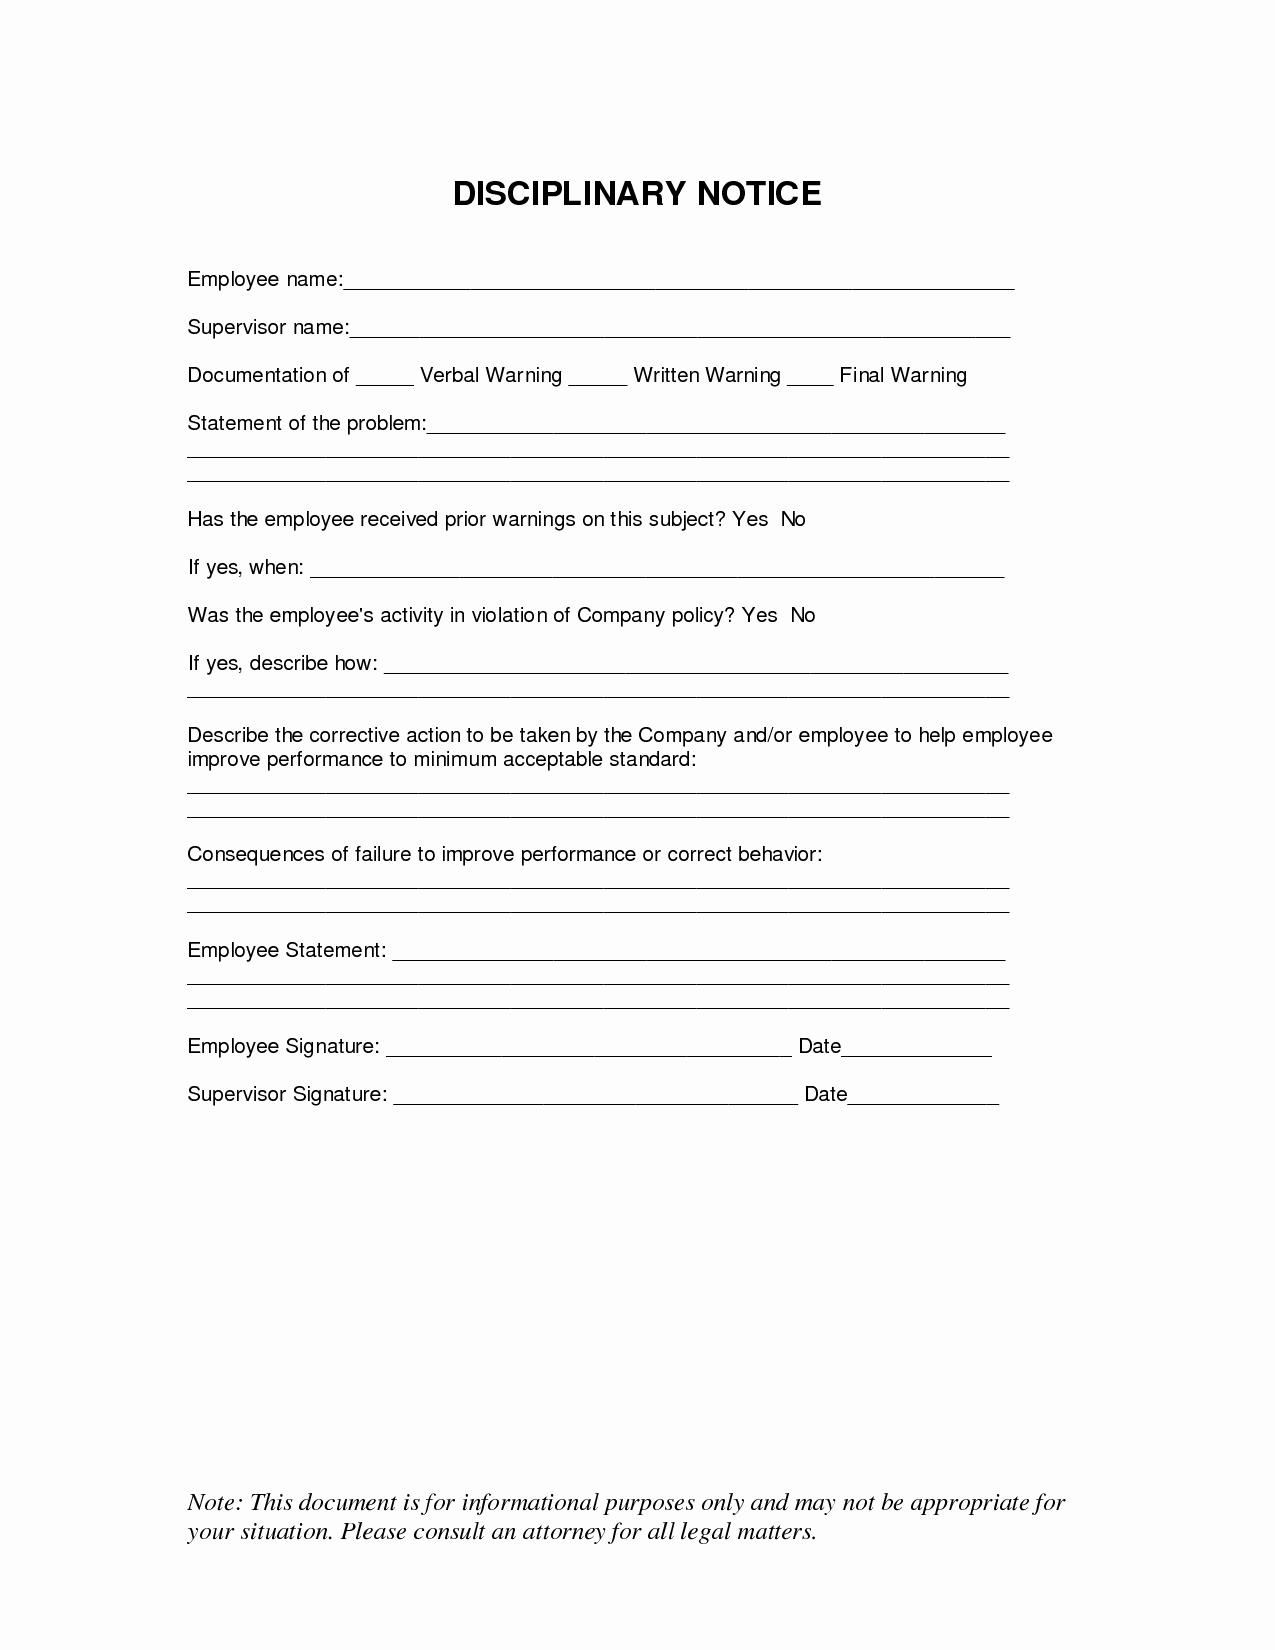 Employee Discipline form Template Best Of 10 Best Of Disciplinary Notice Template Employee